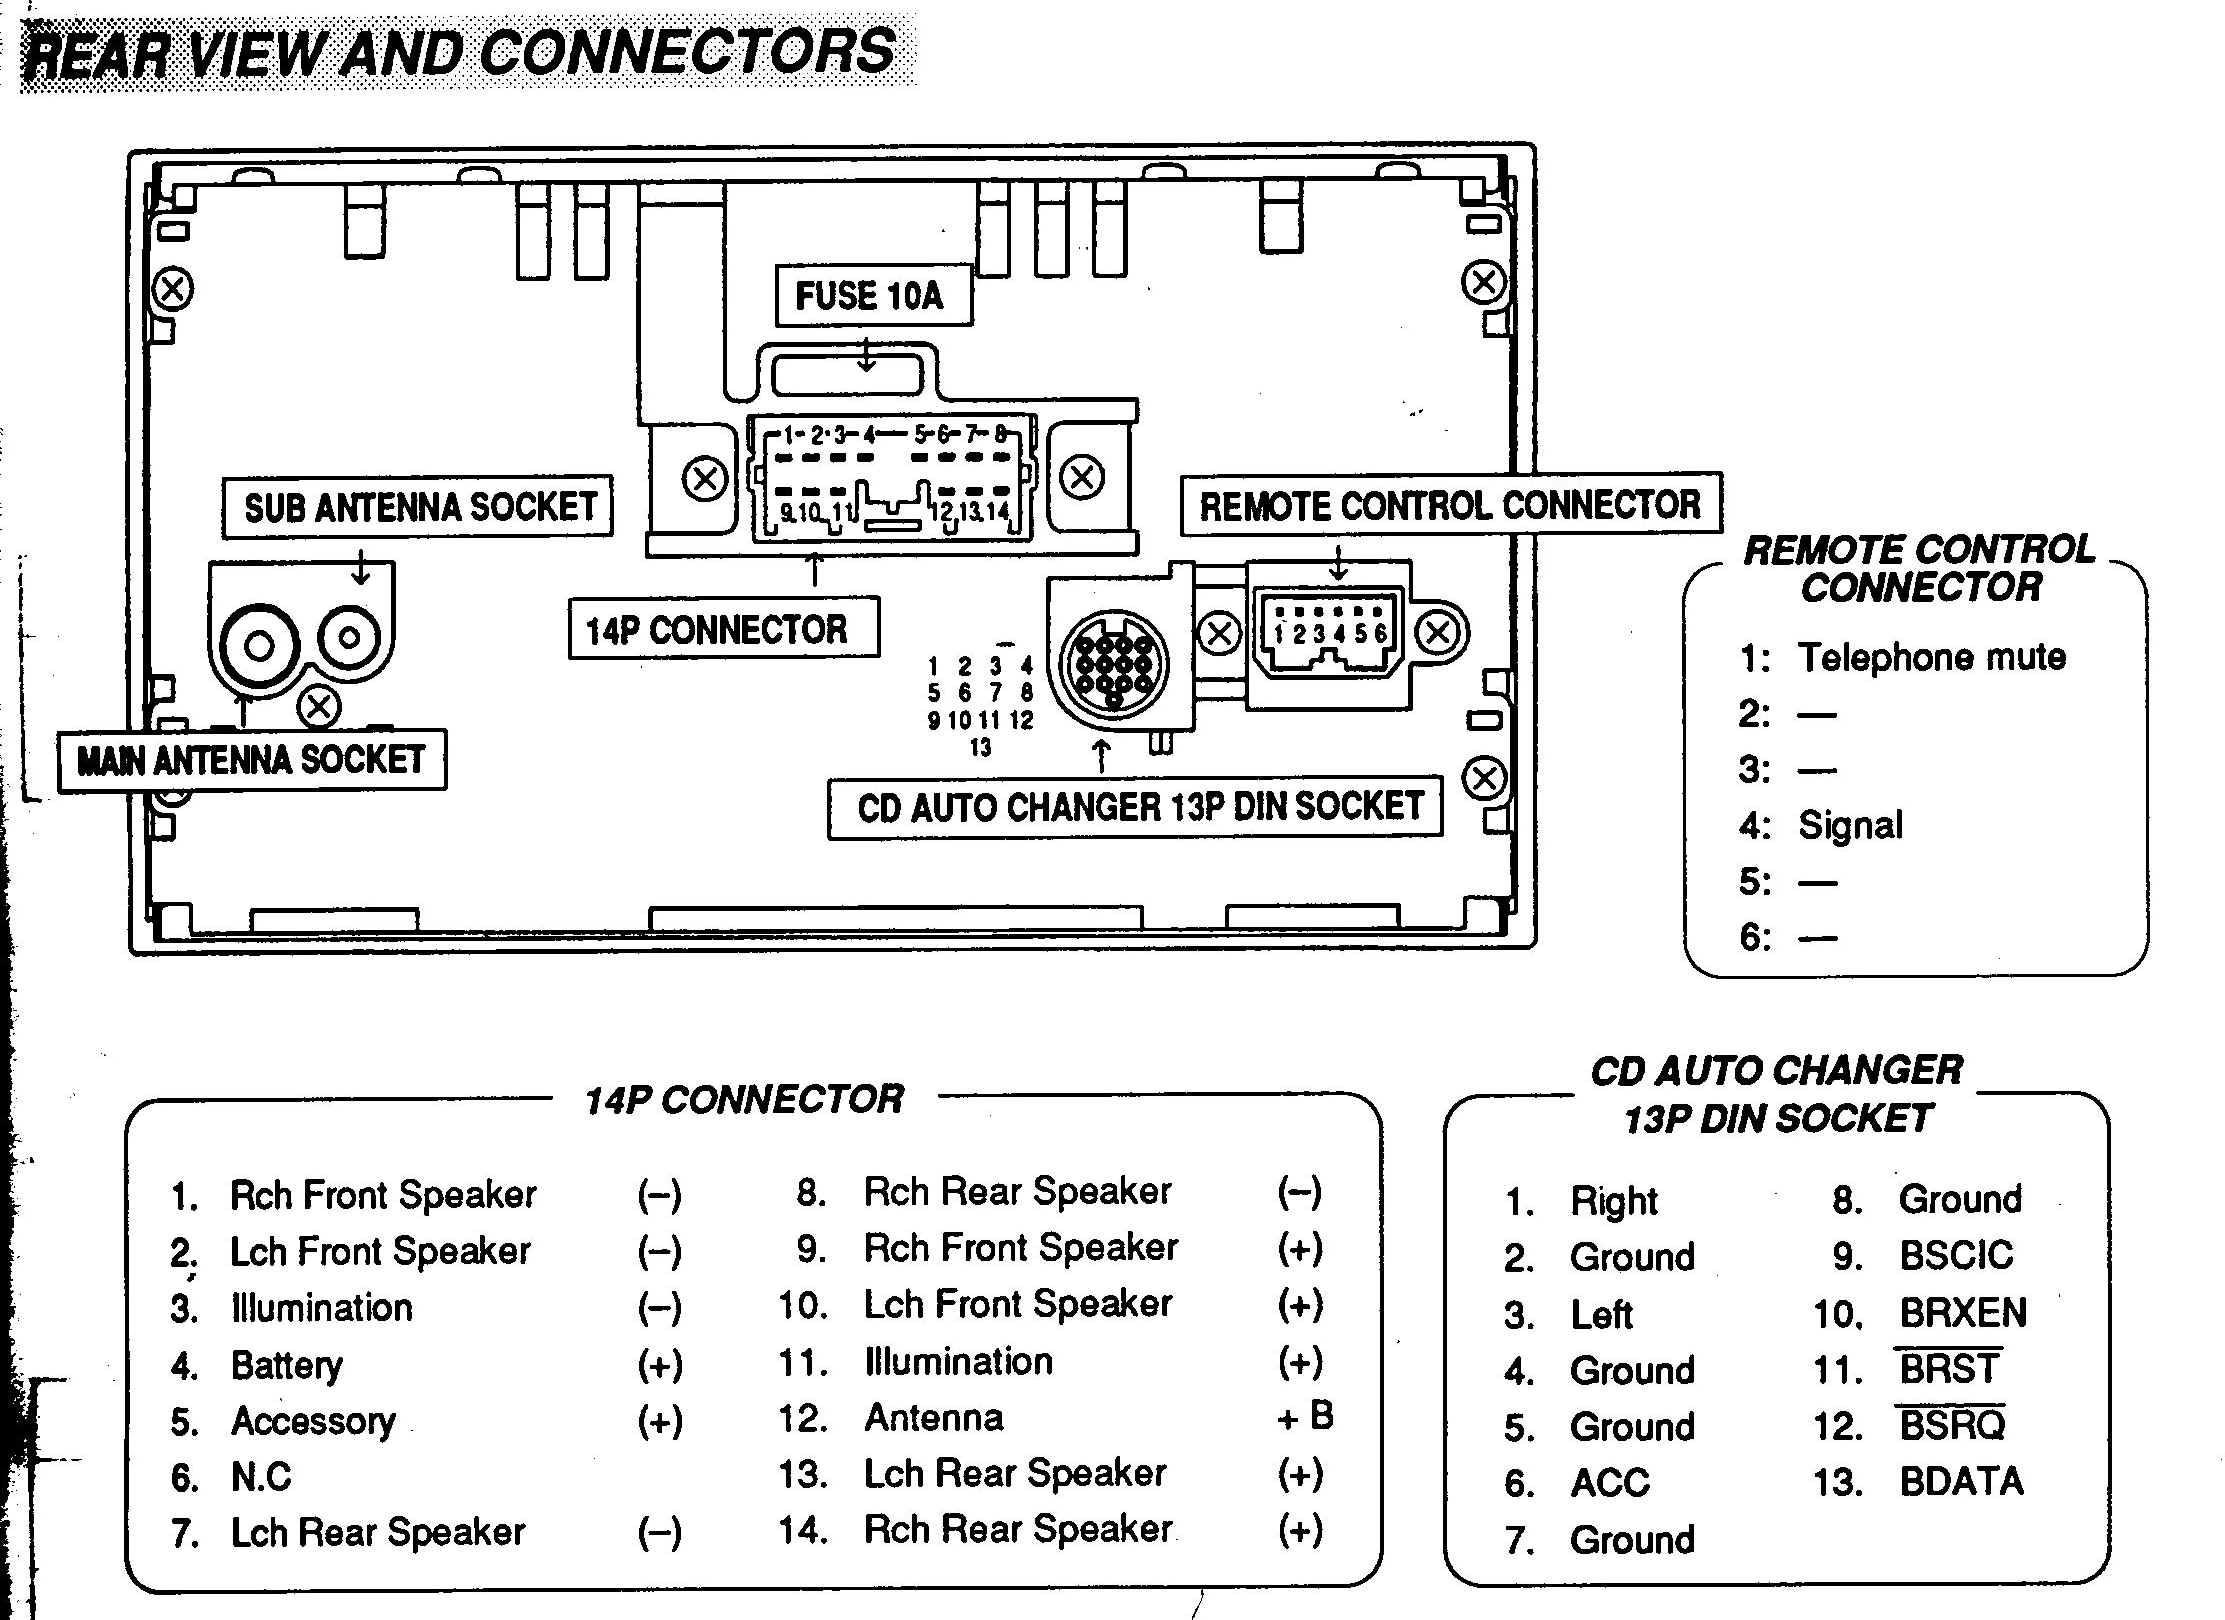 2000 Mitsubishi Galant Engine Diagram Mitsubishi Radio Wiring Wiring Diagram Of 2000 Mitsubishi Galant Engine Diagram